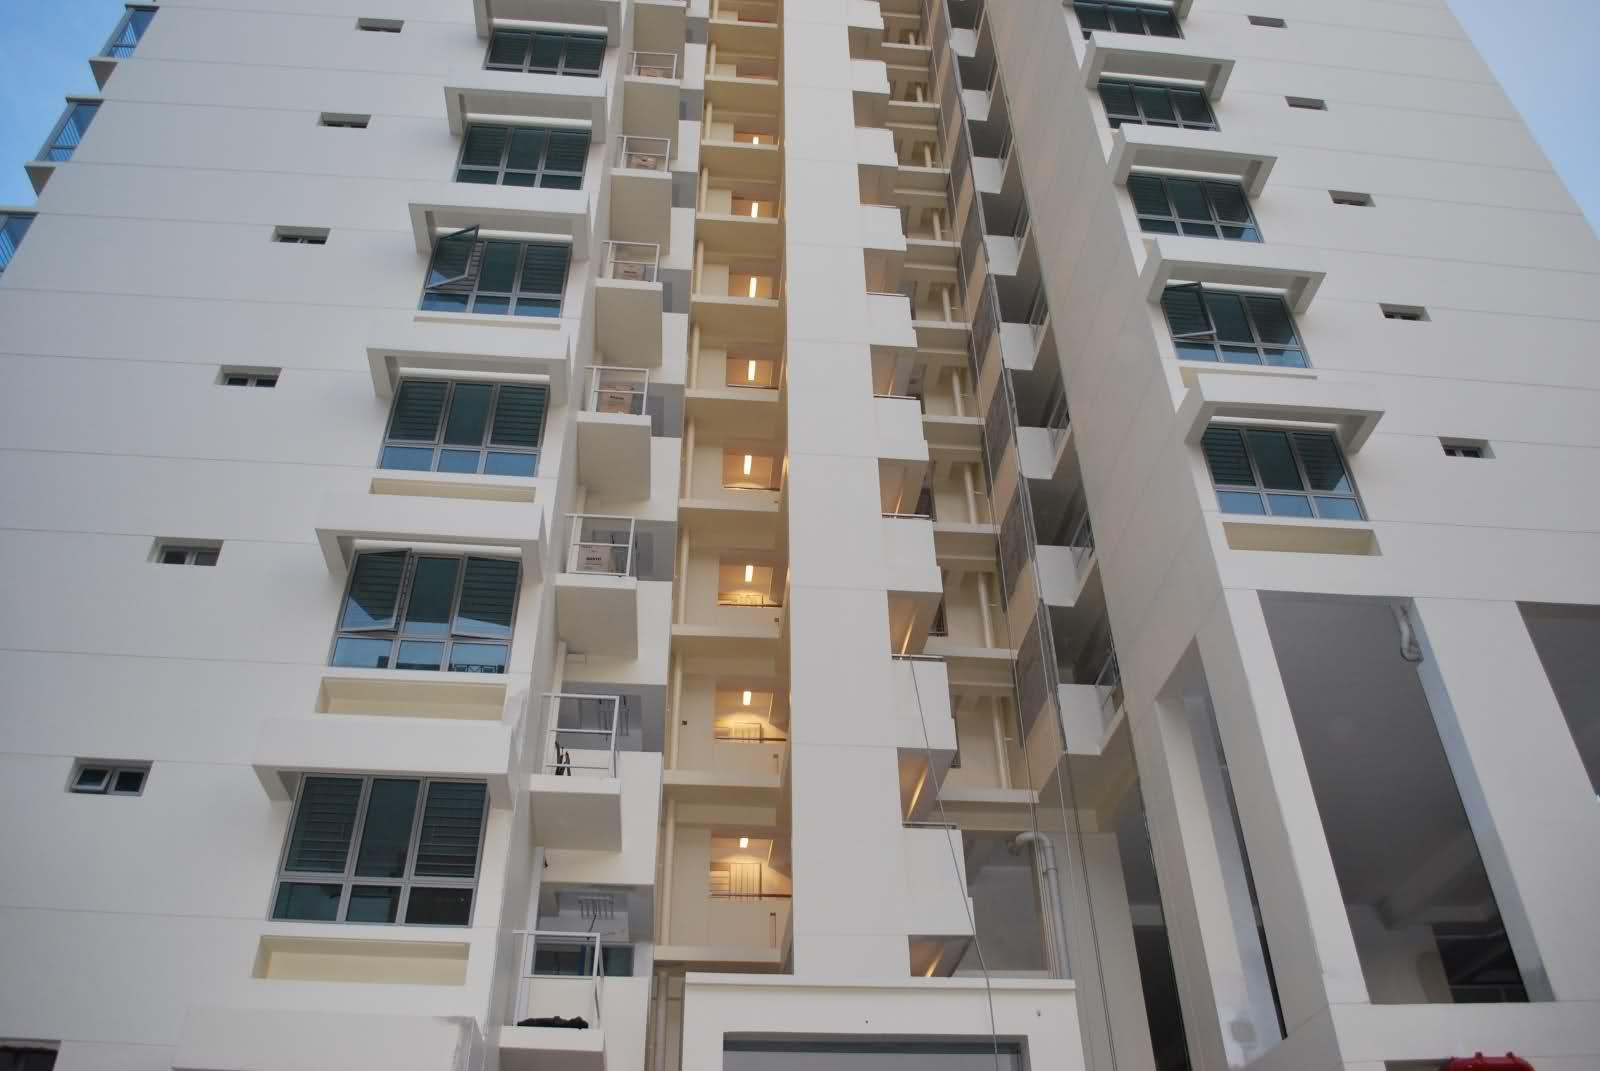 Wrought Aluminium window door gate Singapore: Choosing